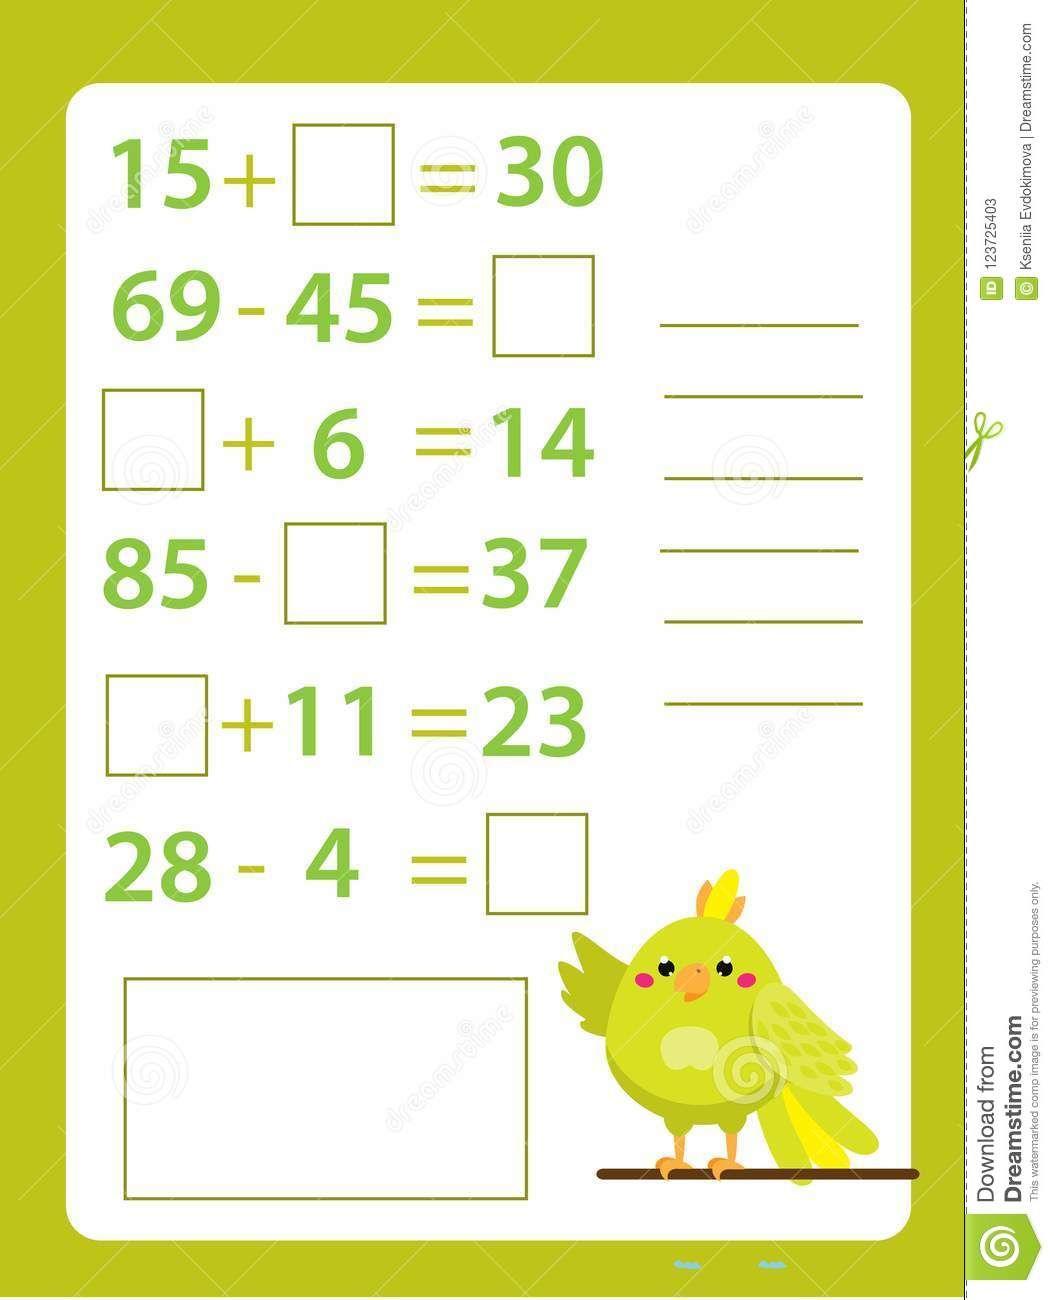 Math Worksheets For Kindergarten Counting